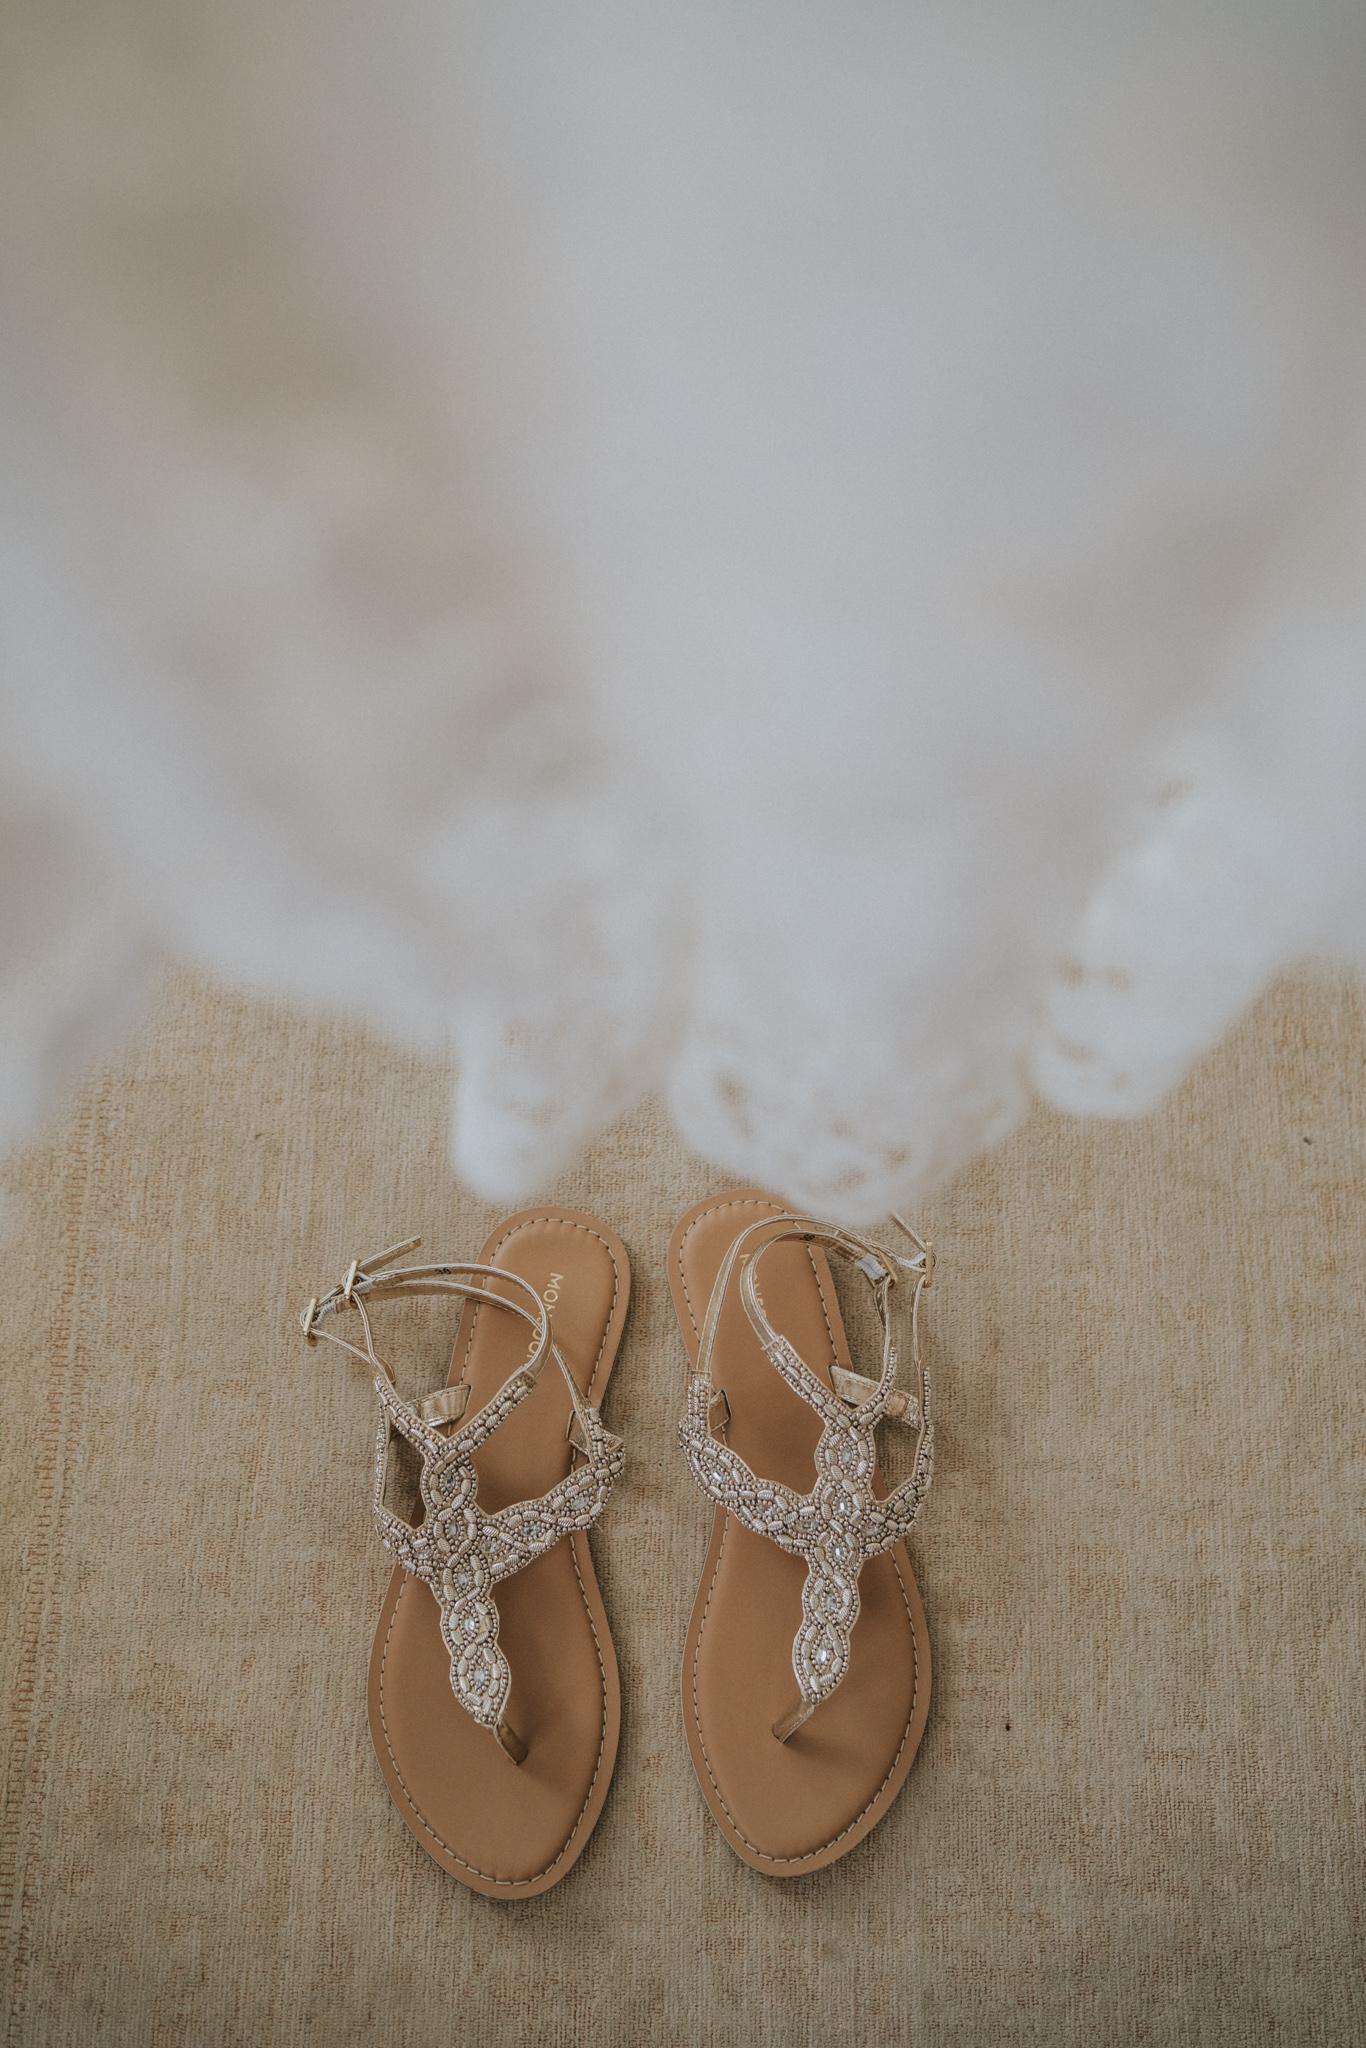 Grace-Elizabeth-Georgie-Amalaketu-Firstsite-Colchester-Essex-Boho-Buddhist-Wedding-Alternative-Wedding-Photography-Essex (2 of 100).jpg